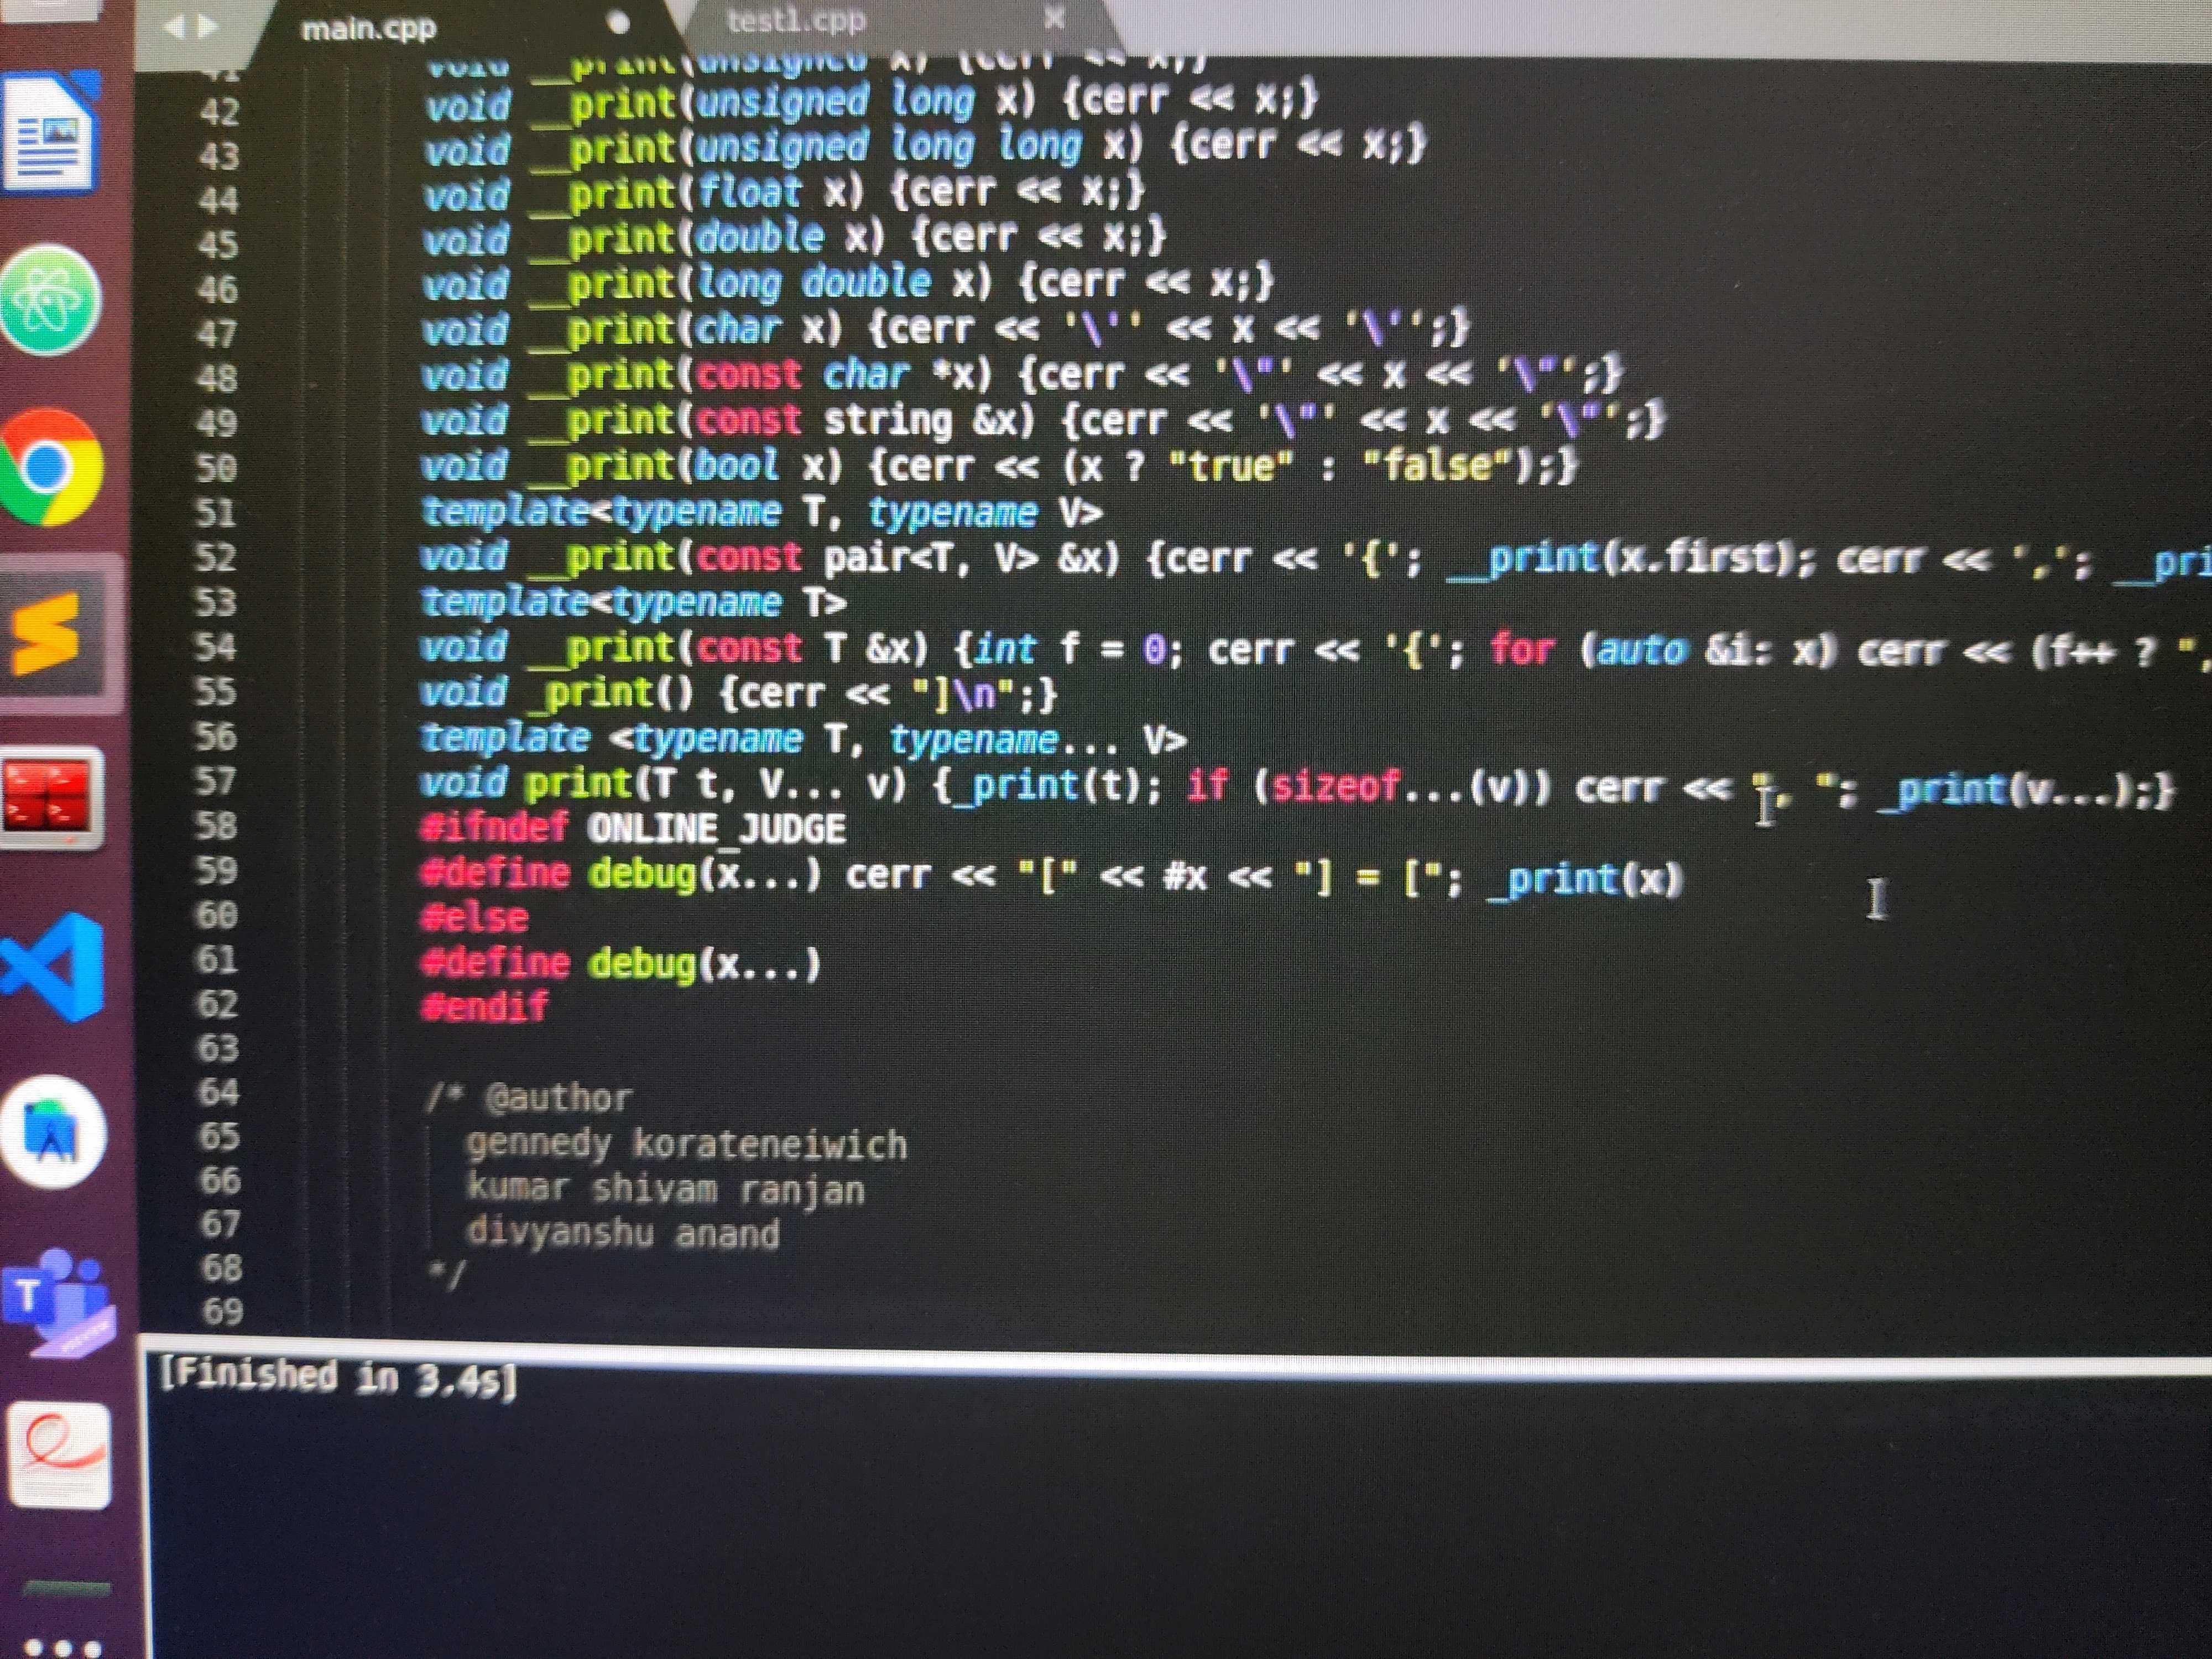 https://cloud-ccckw2cp8.vercel.app/0img_20201122_032014.jpg